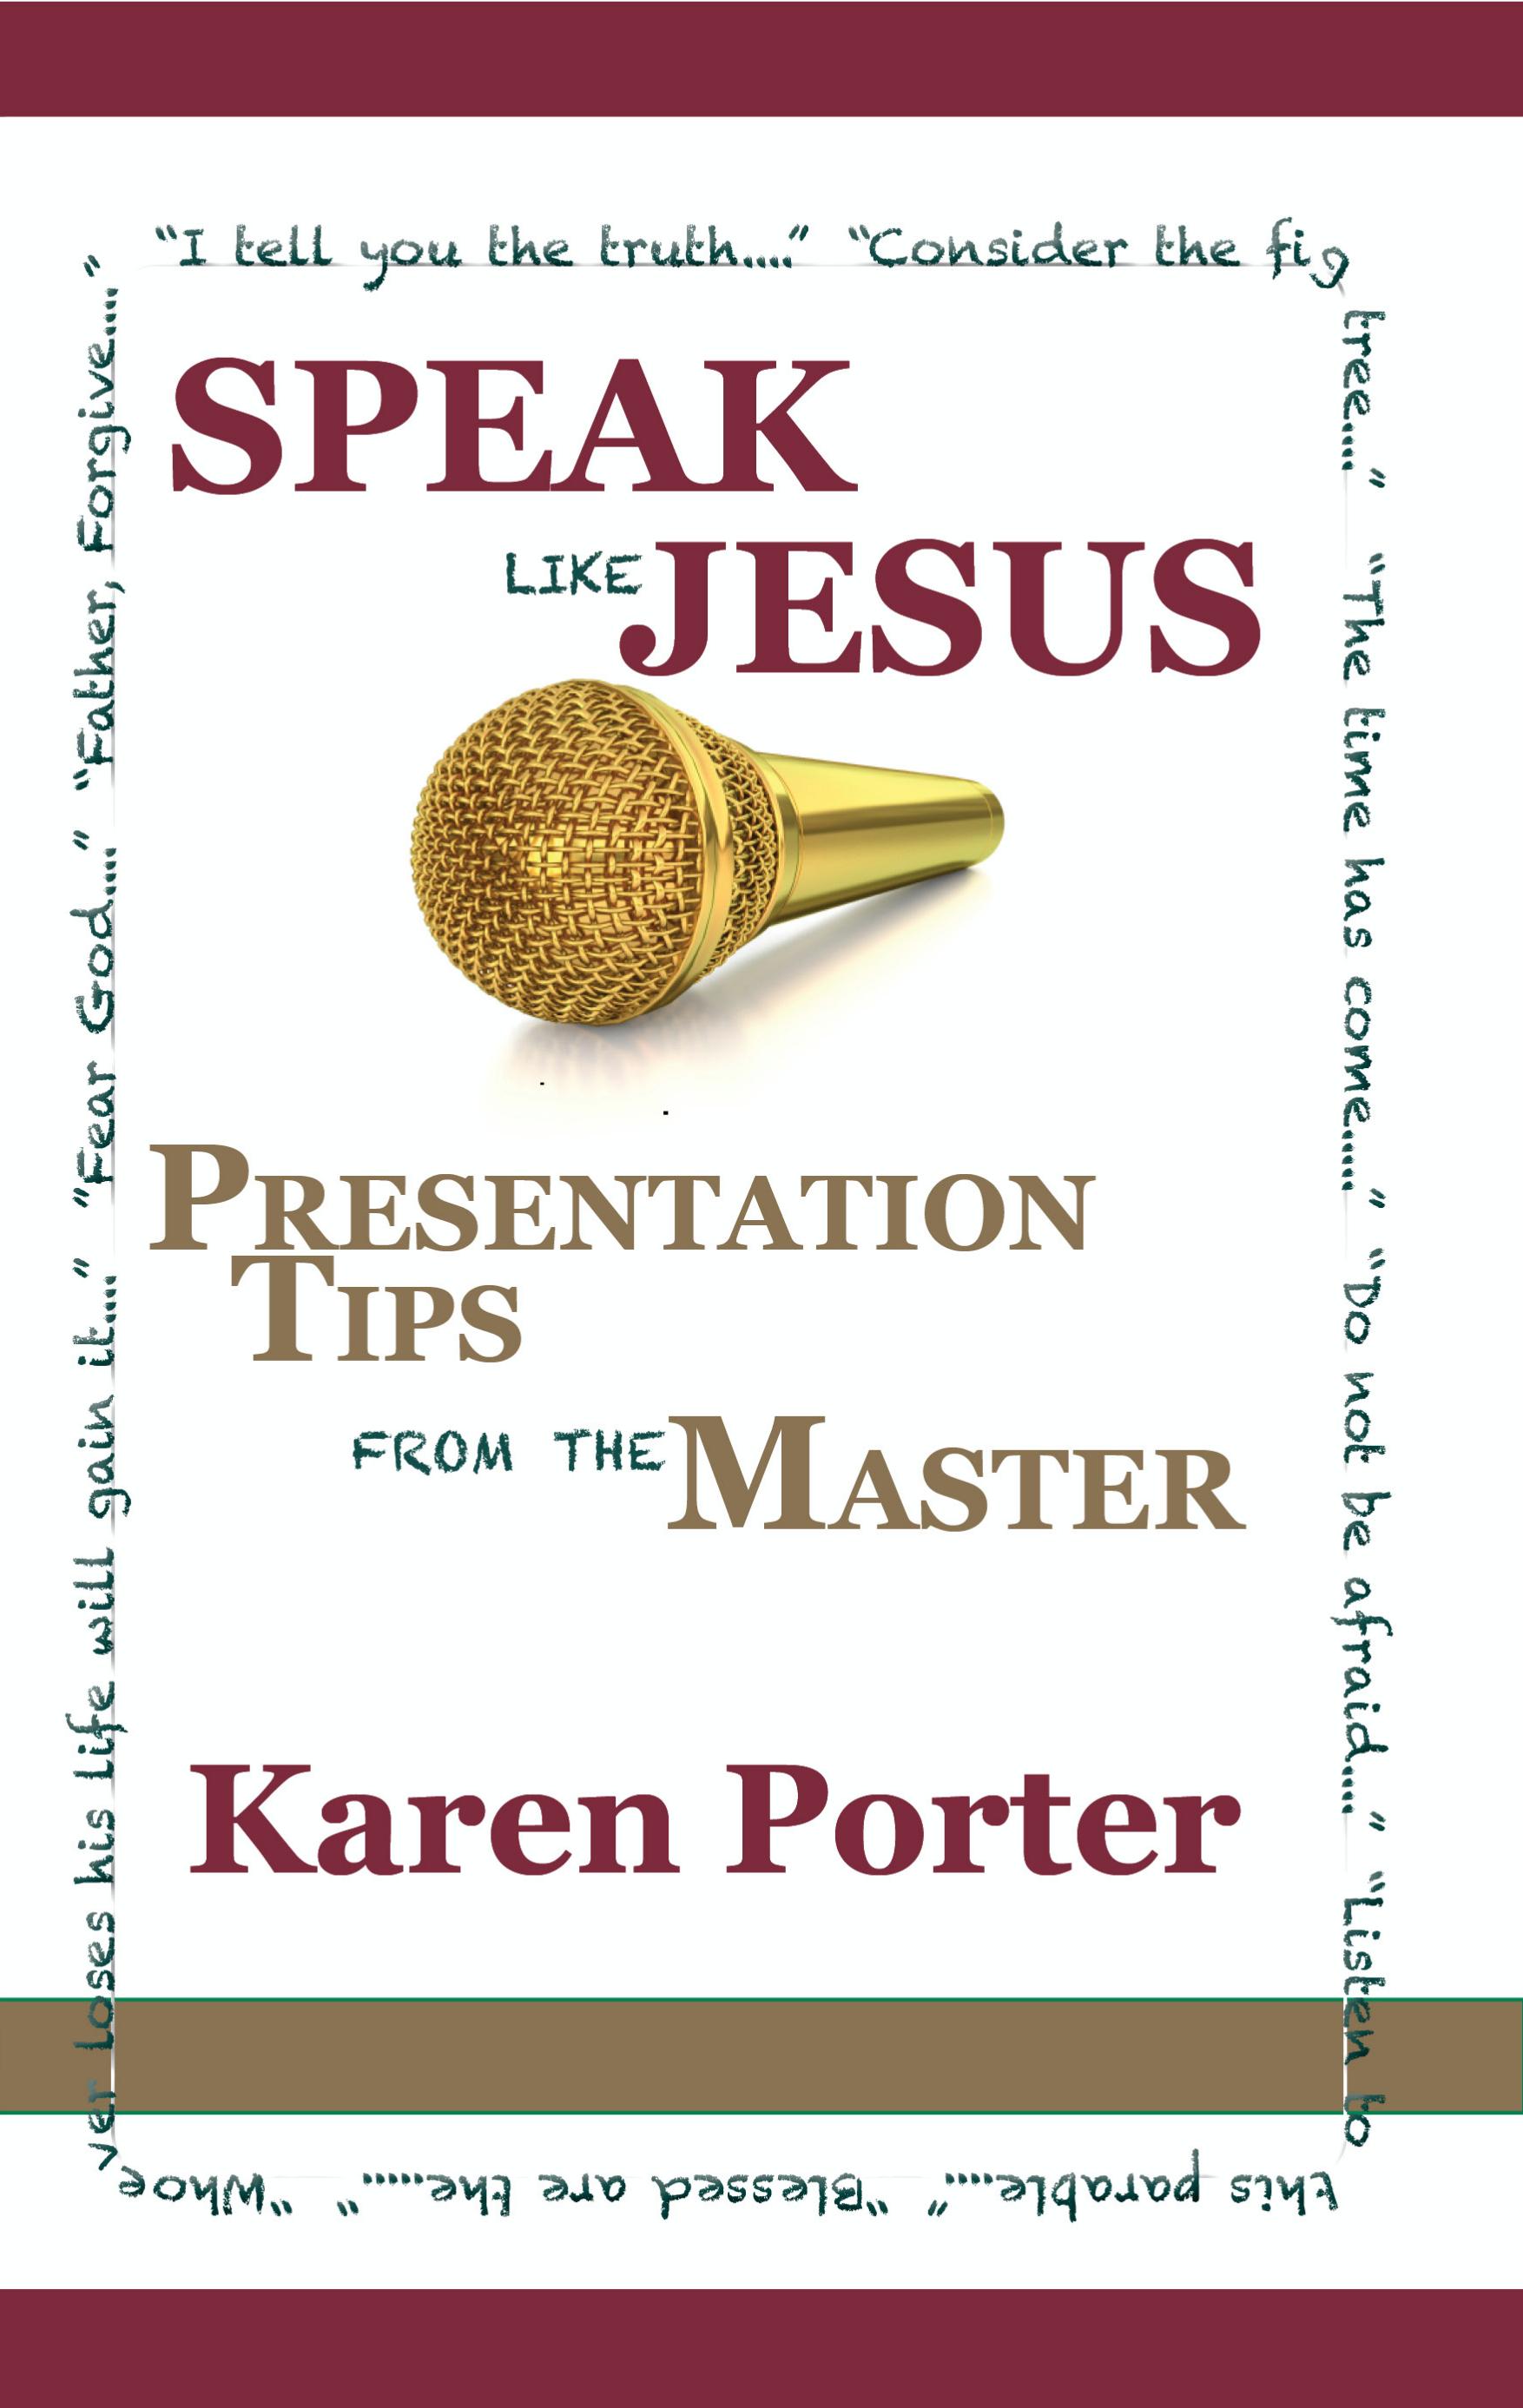 Speak Like Jesus - Presentation Tips from the Master